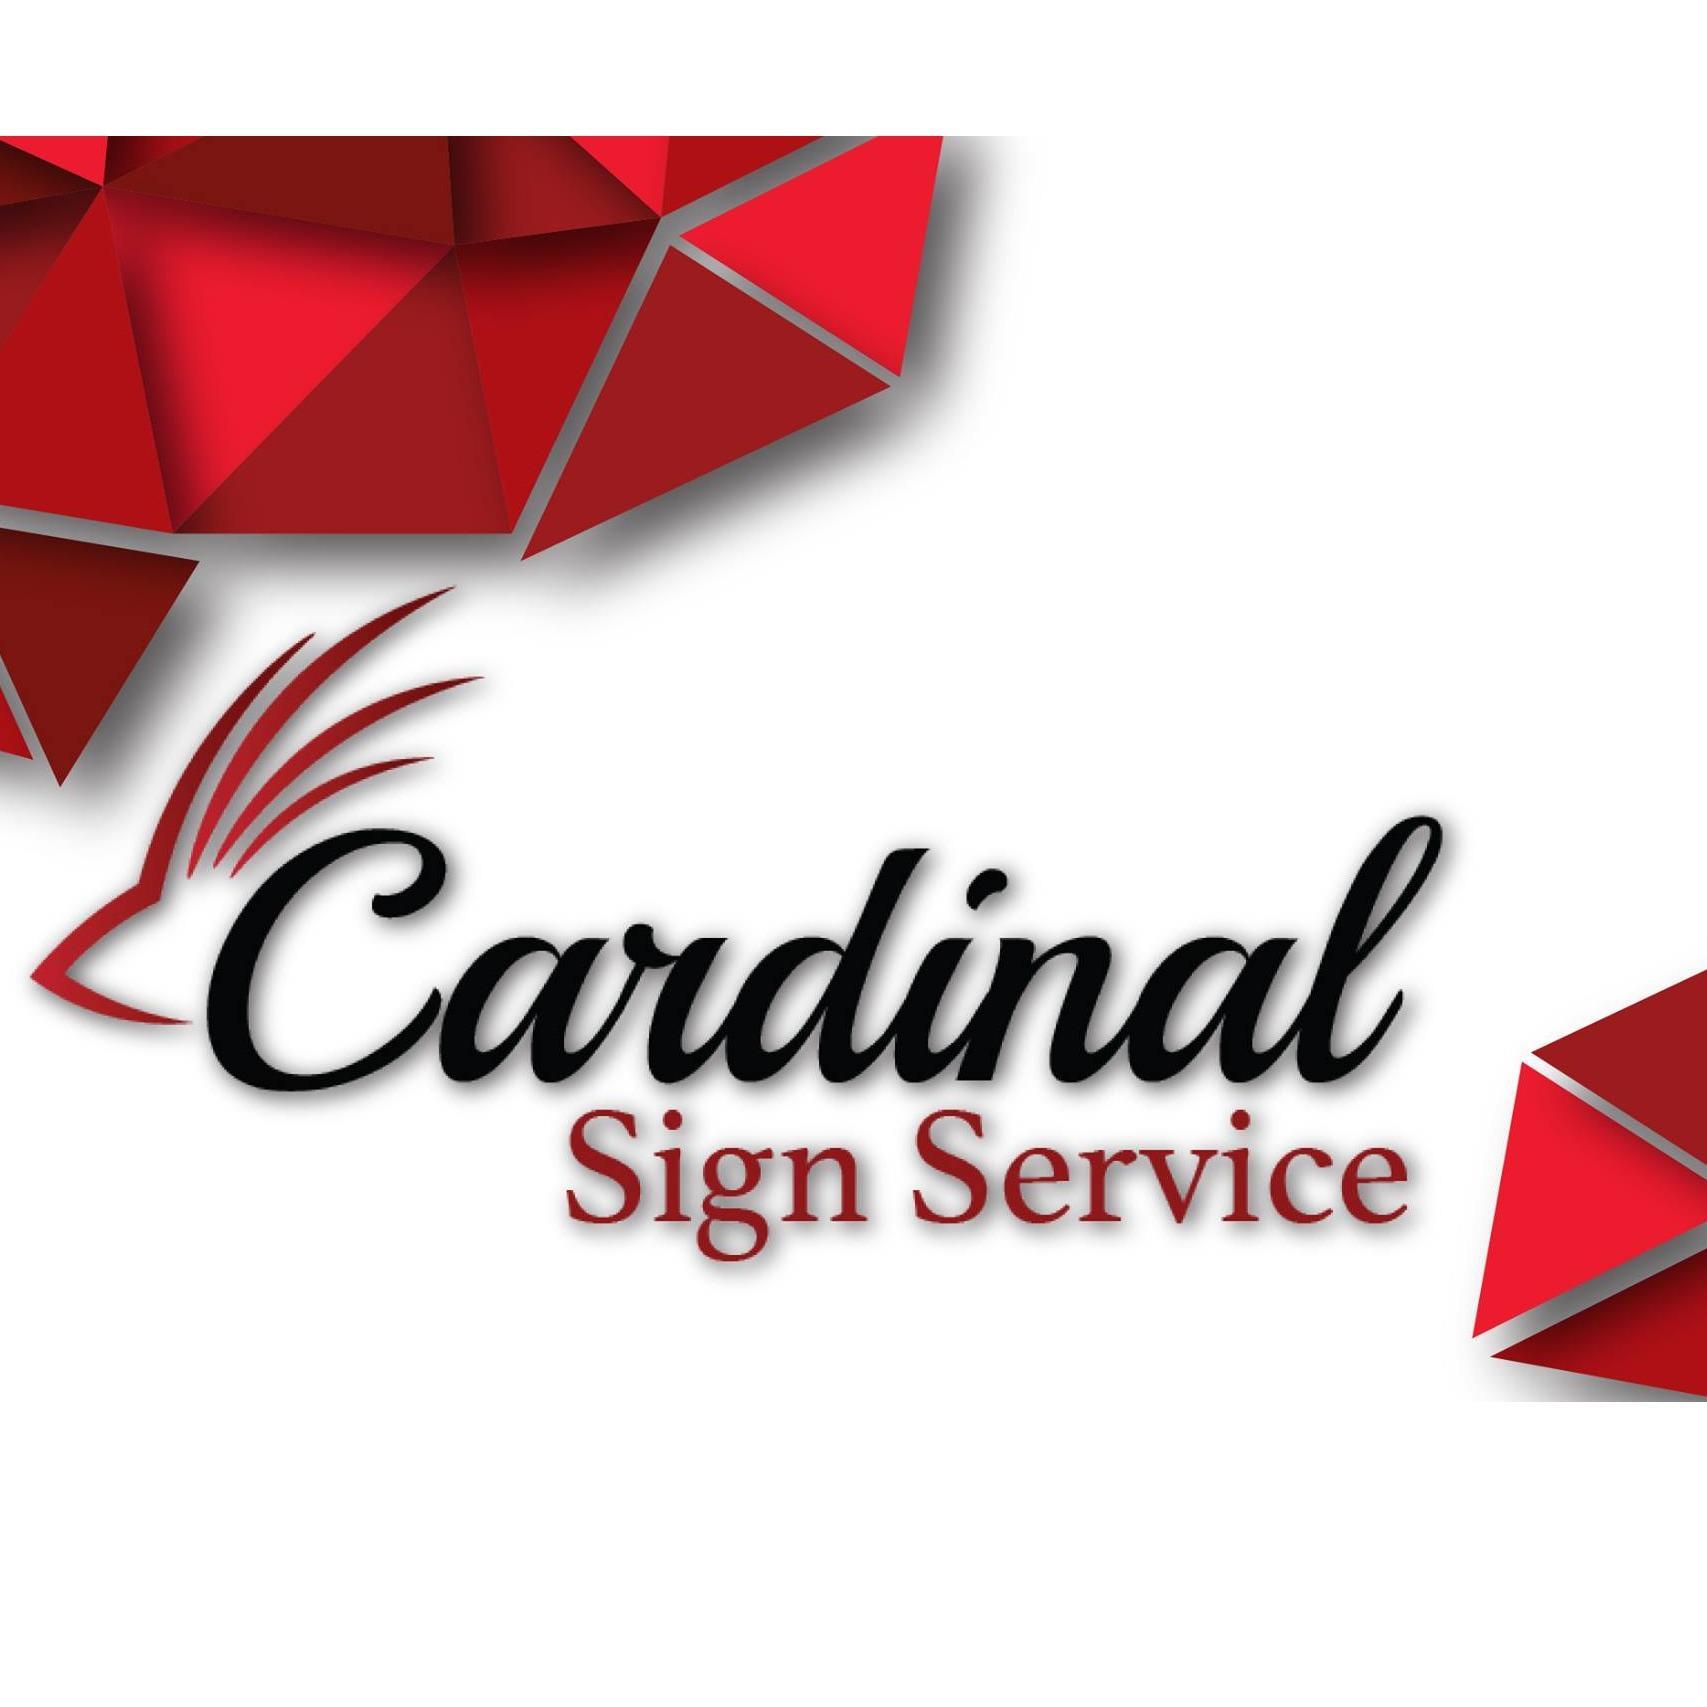 Cardinal Sign Service - Newburgh, IN 47630 - (812)499-0311 | ShowMeLocal.com